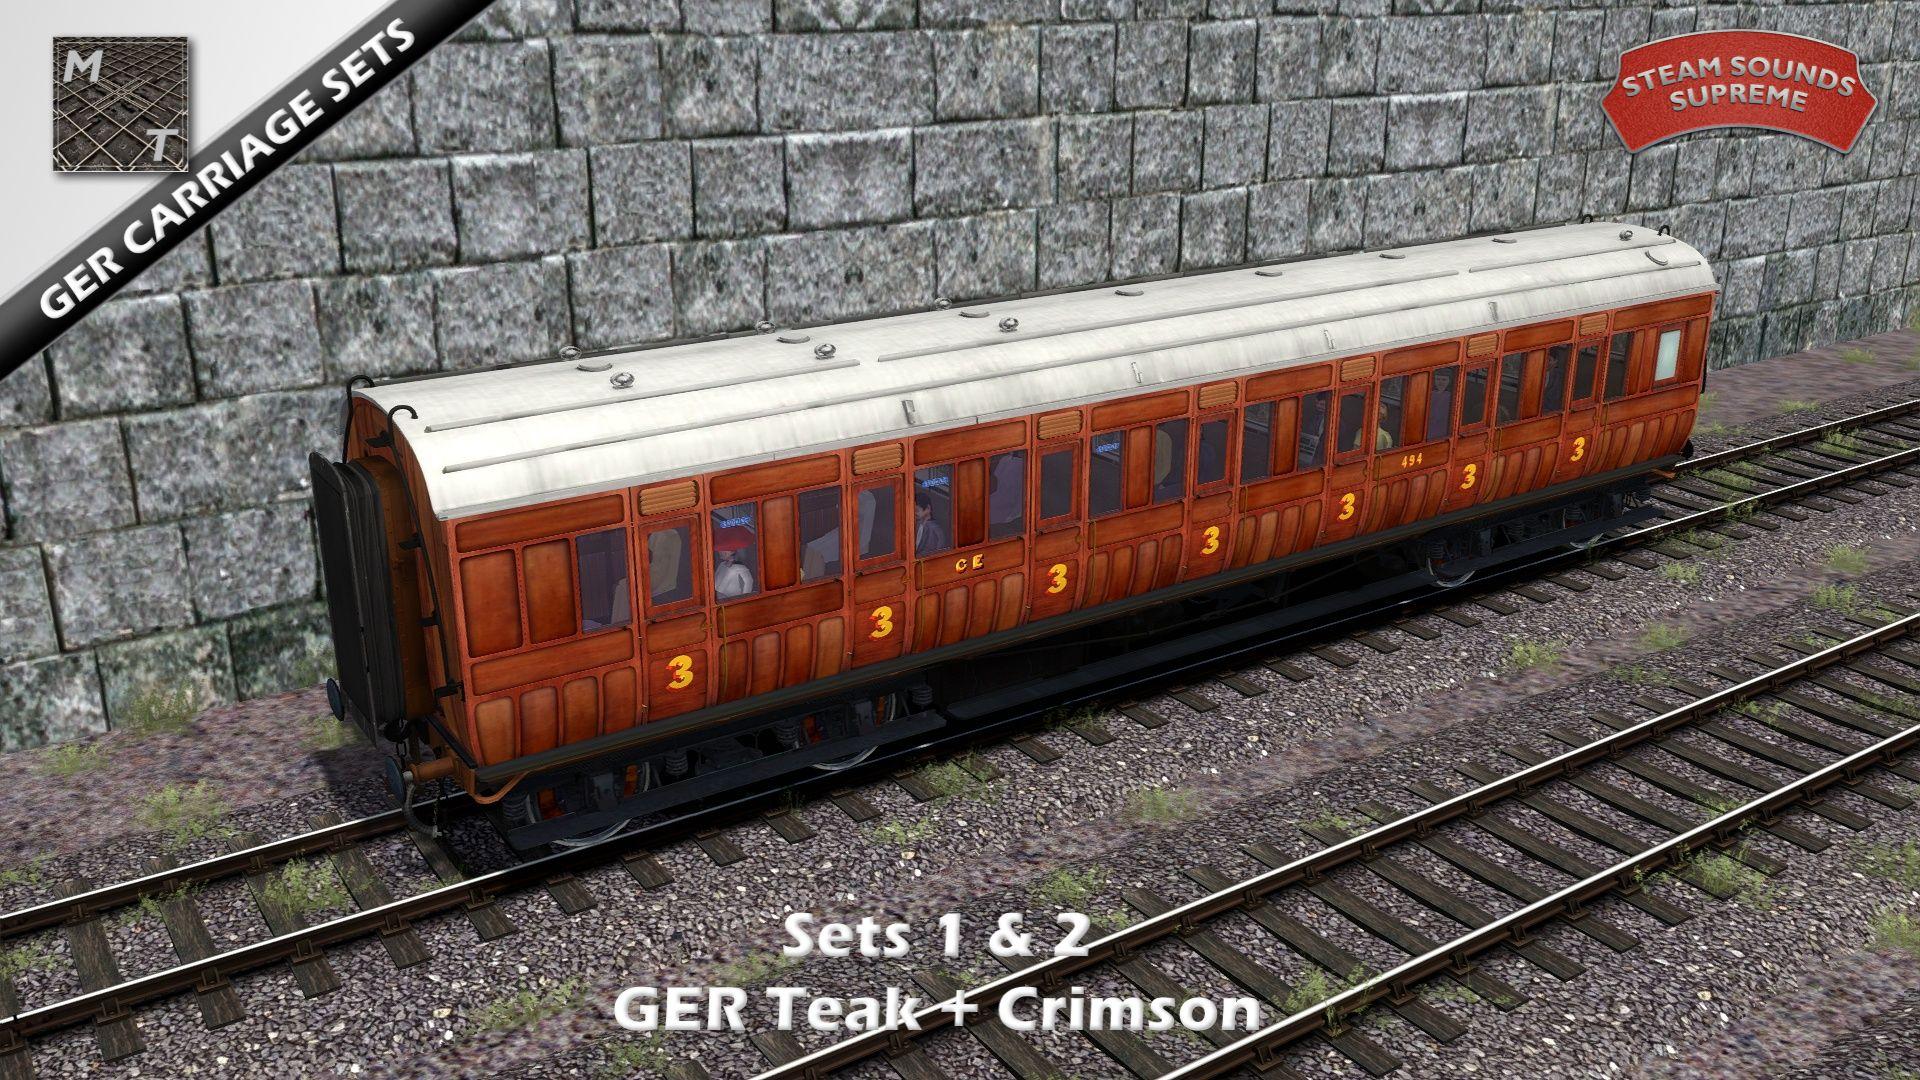 GERCorrSet1-2_09.jpg